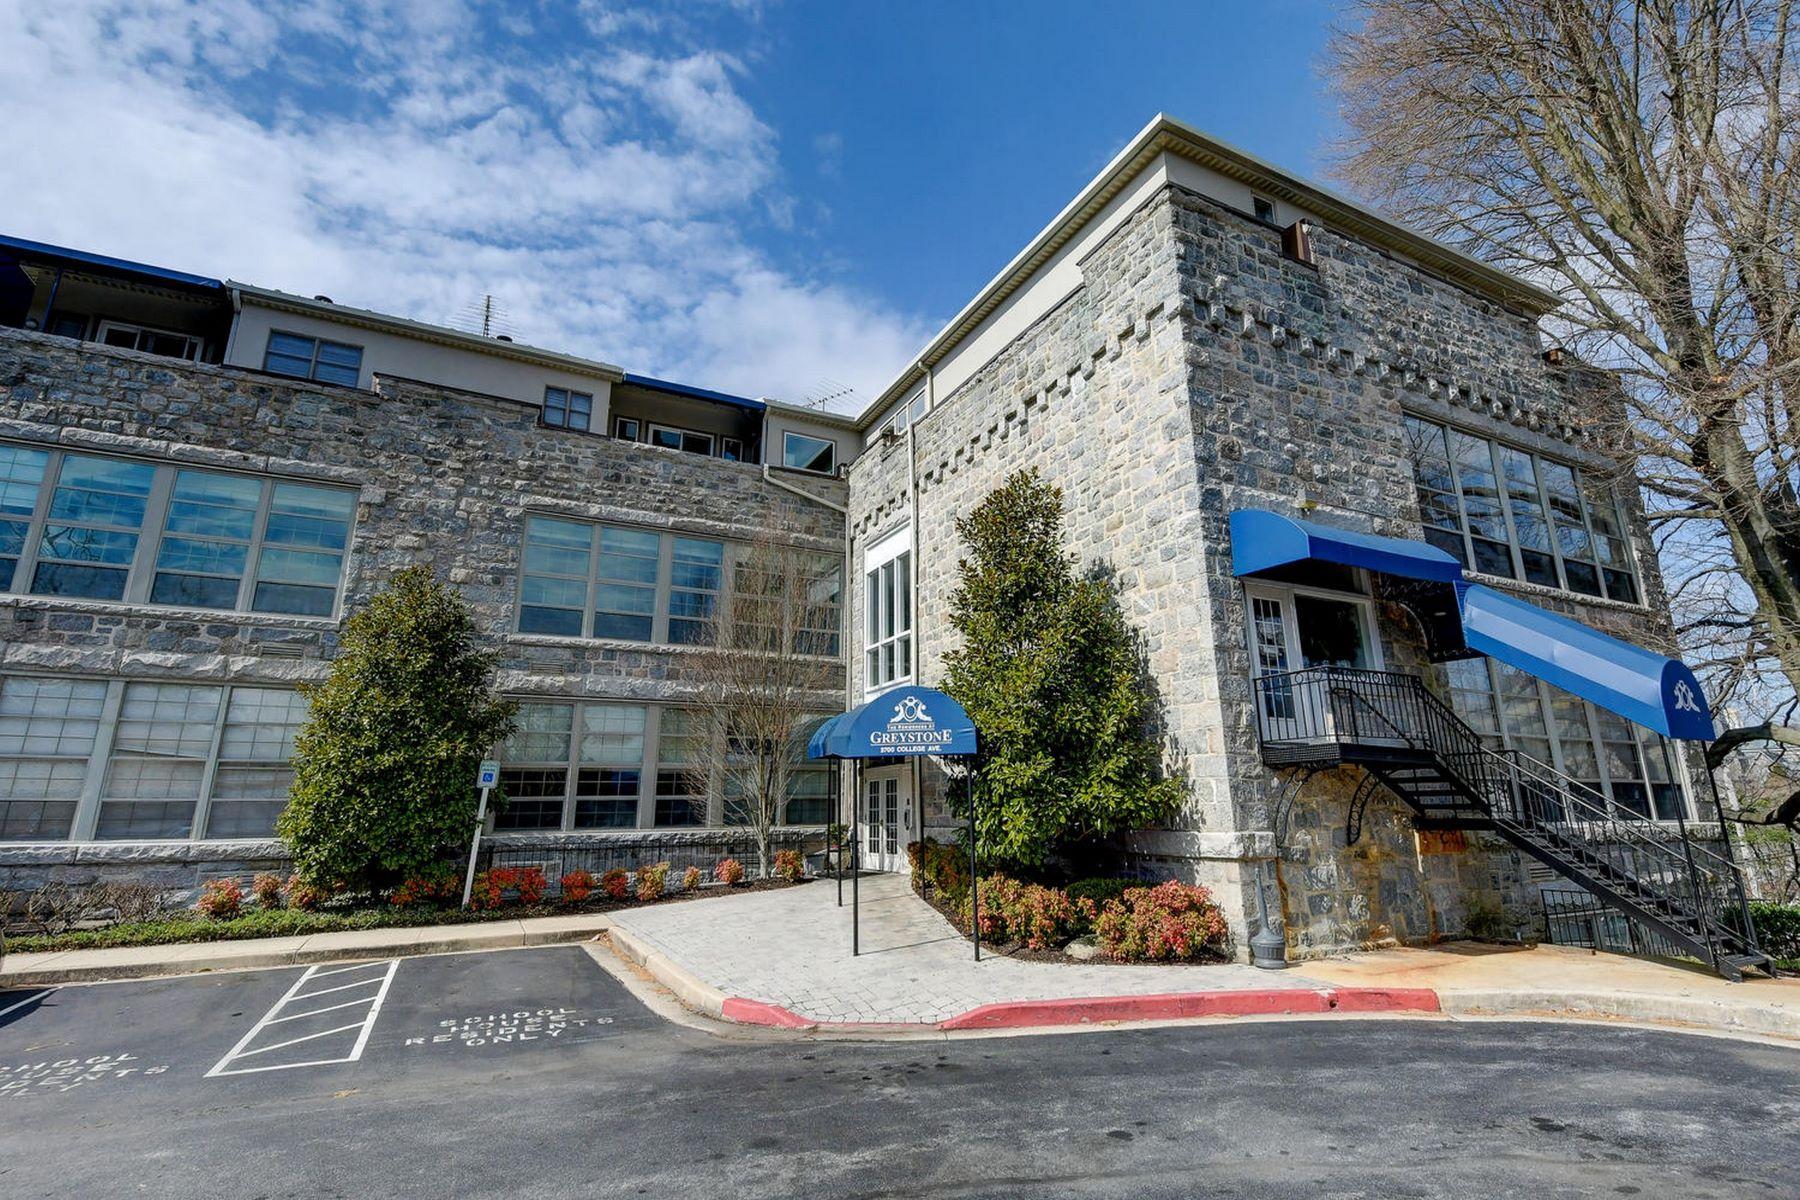 Condominiums for Sale at Greystone's Glory 3700 College Unit 304 Ellicott City, Maryland 21043 United States